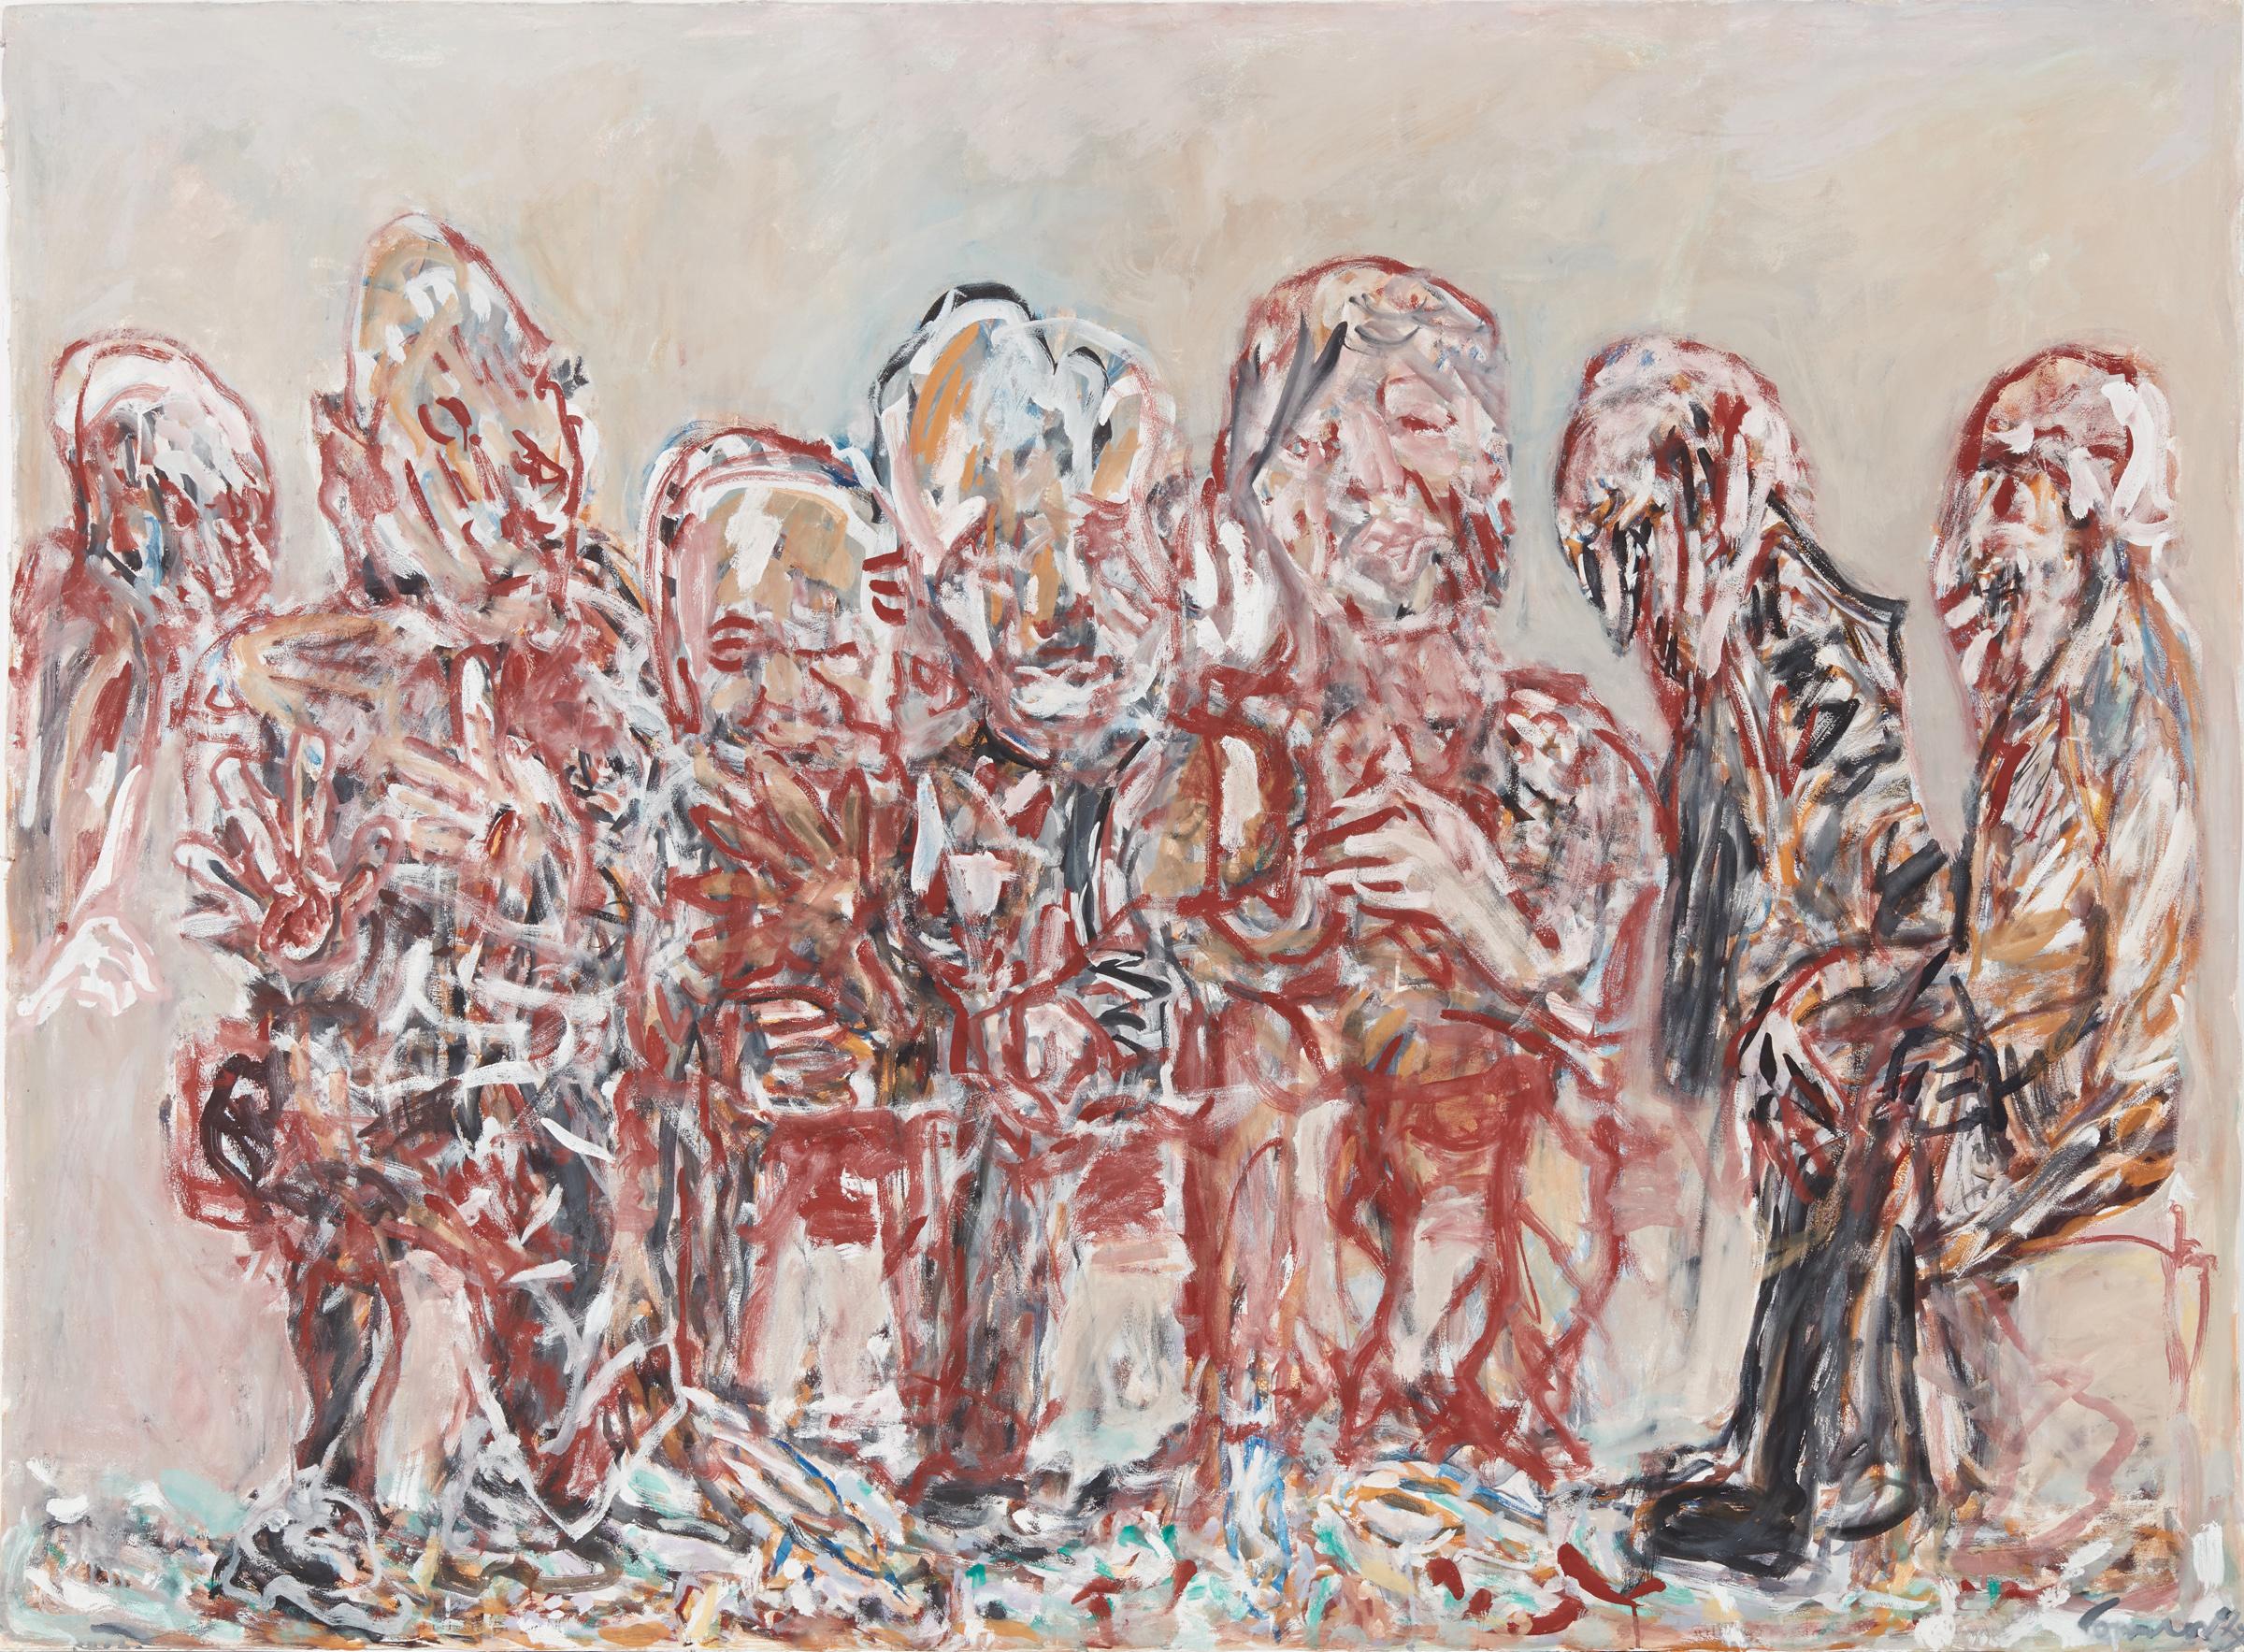 KEVIN CONNOR  Waiting , 2018 gouache on 300gsm cotton paper 141 x 190.5 cm